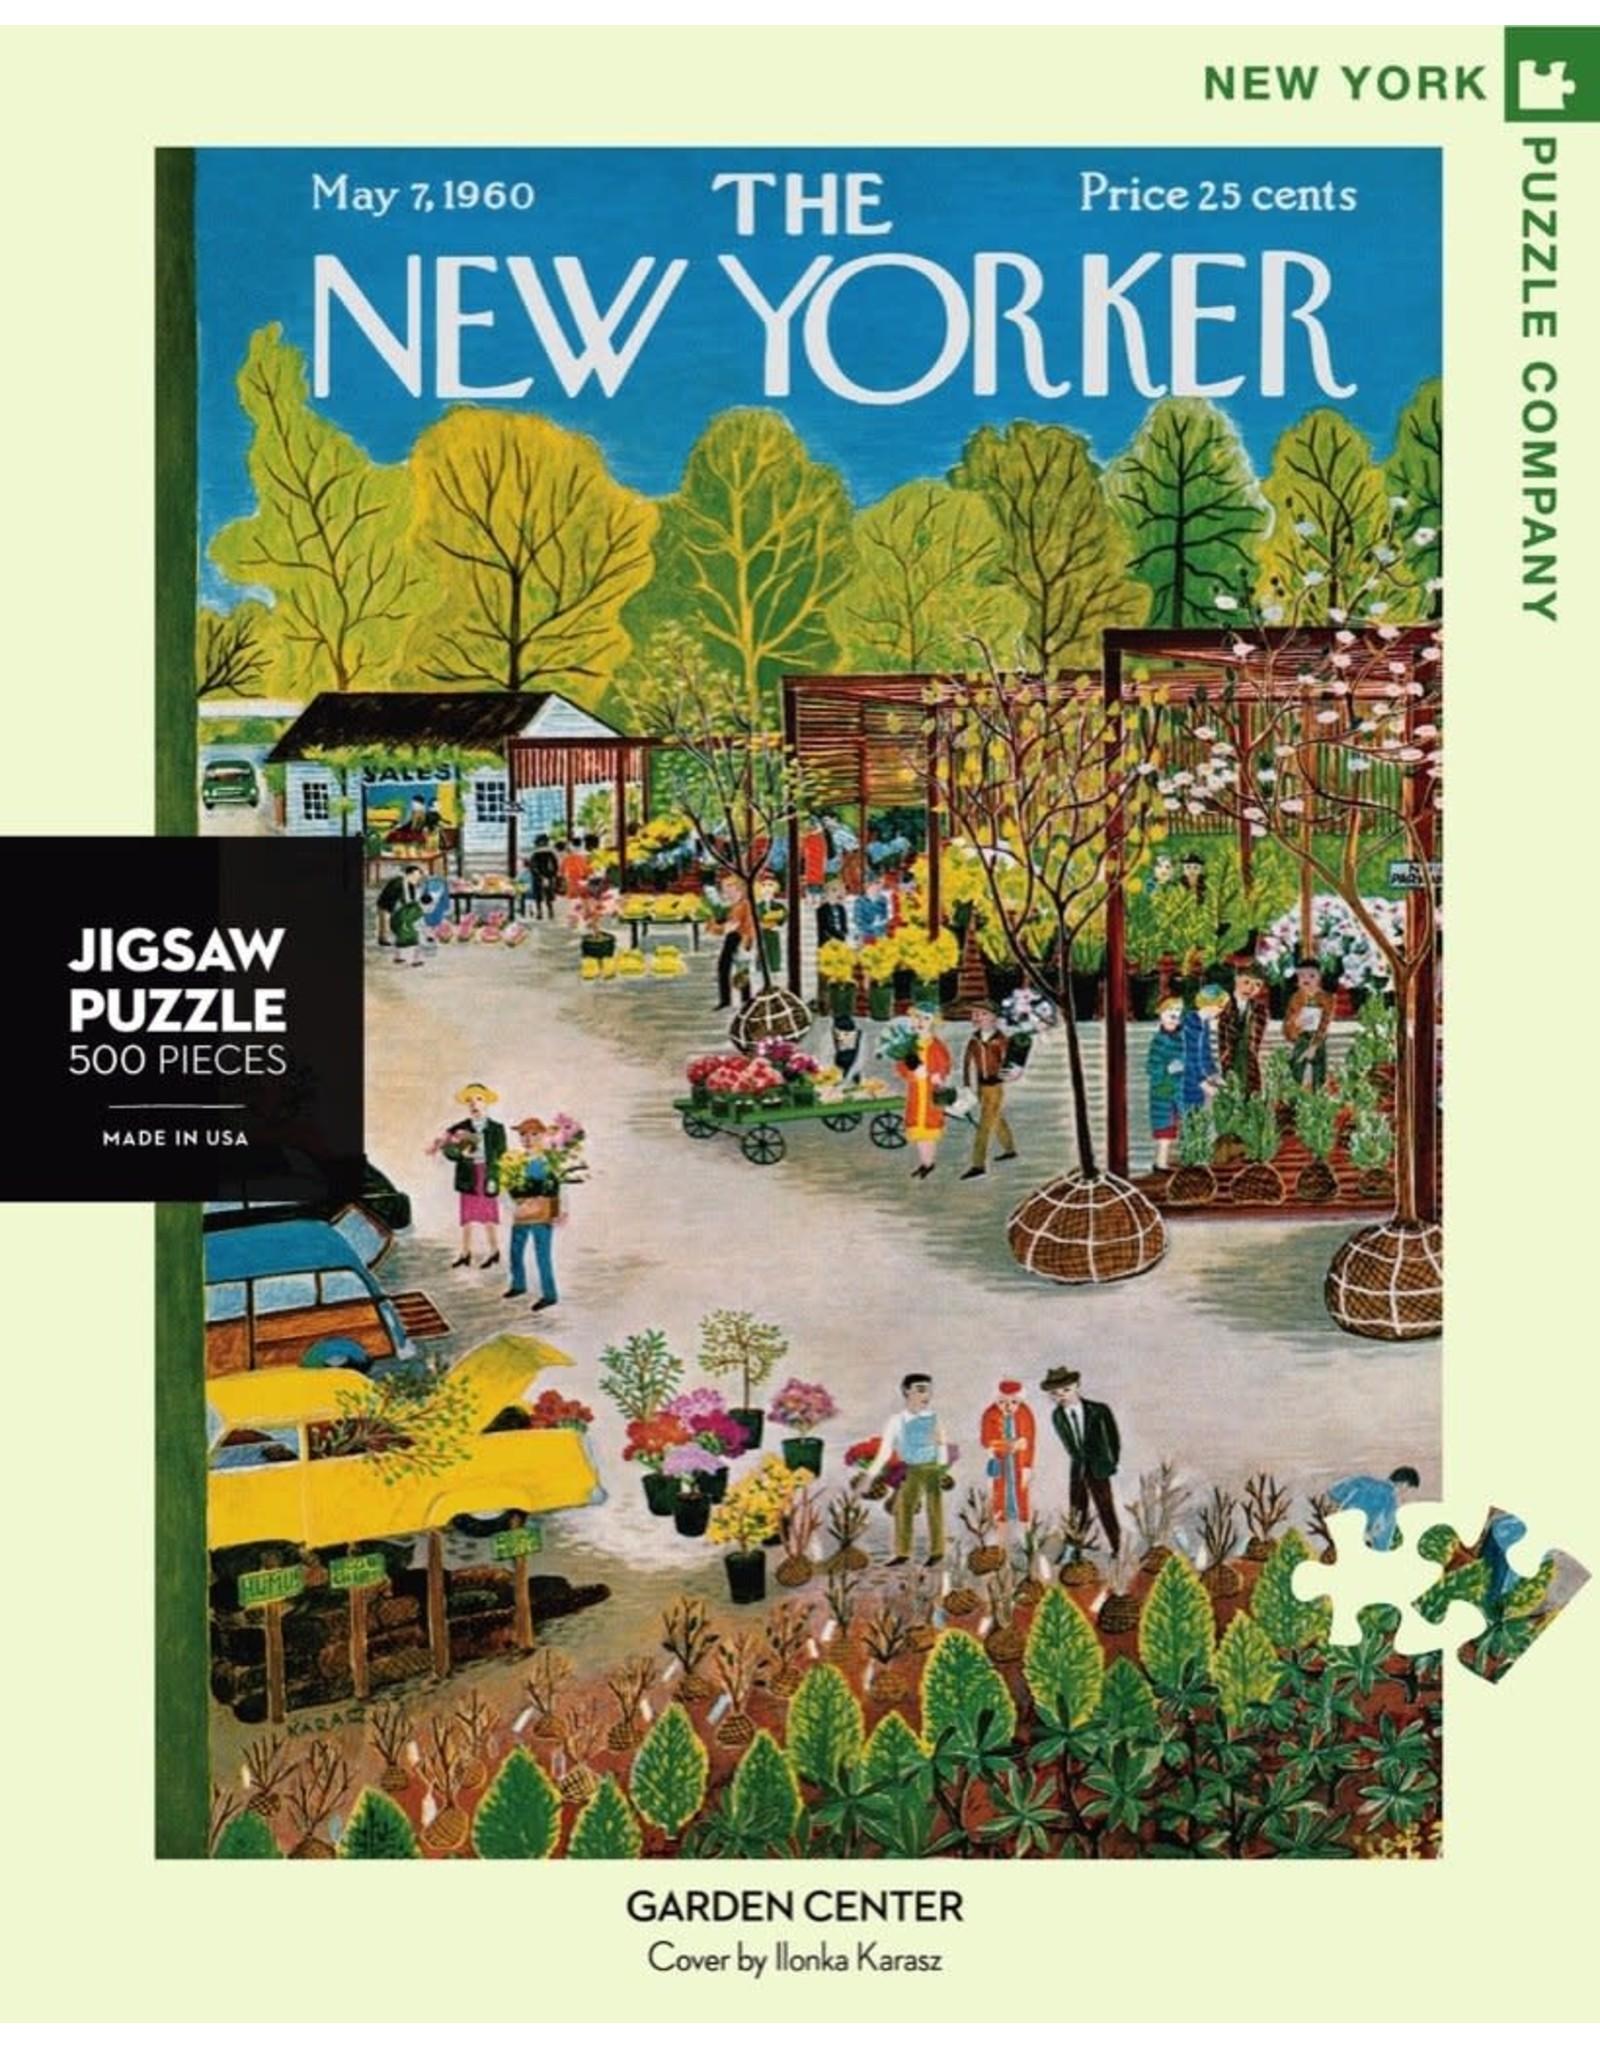 Garden Center 500 piece puzzle